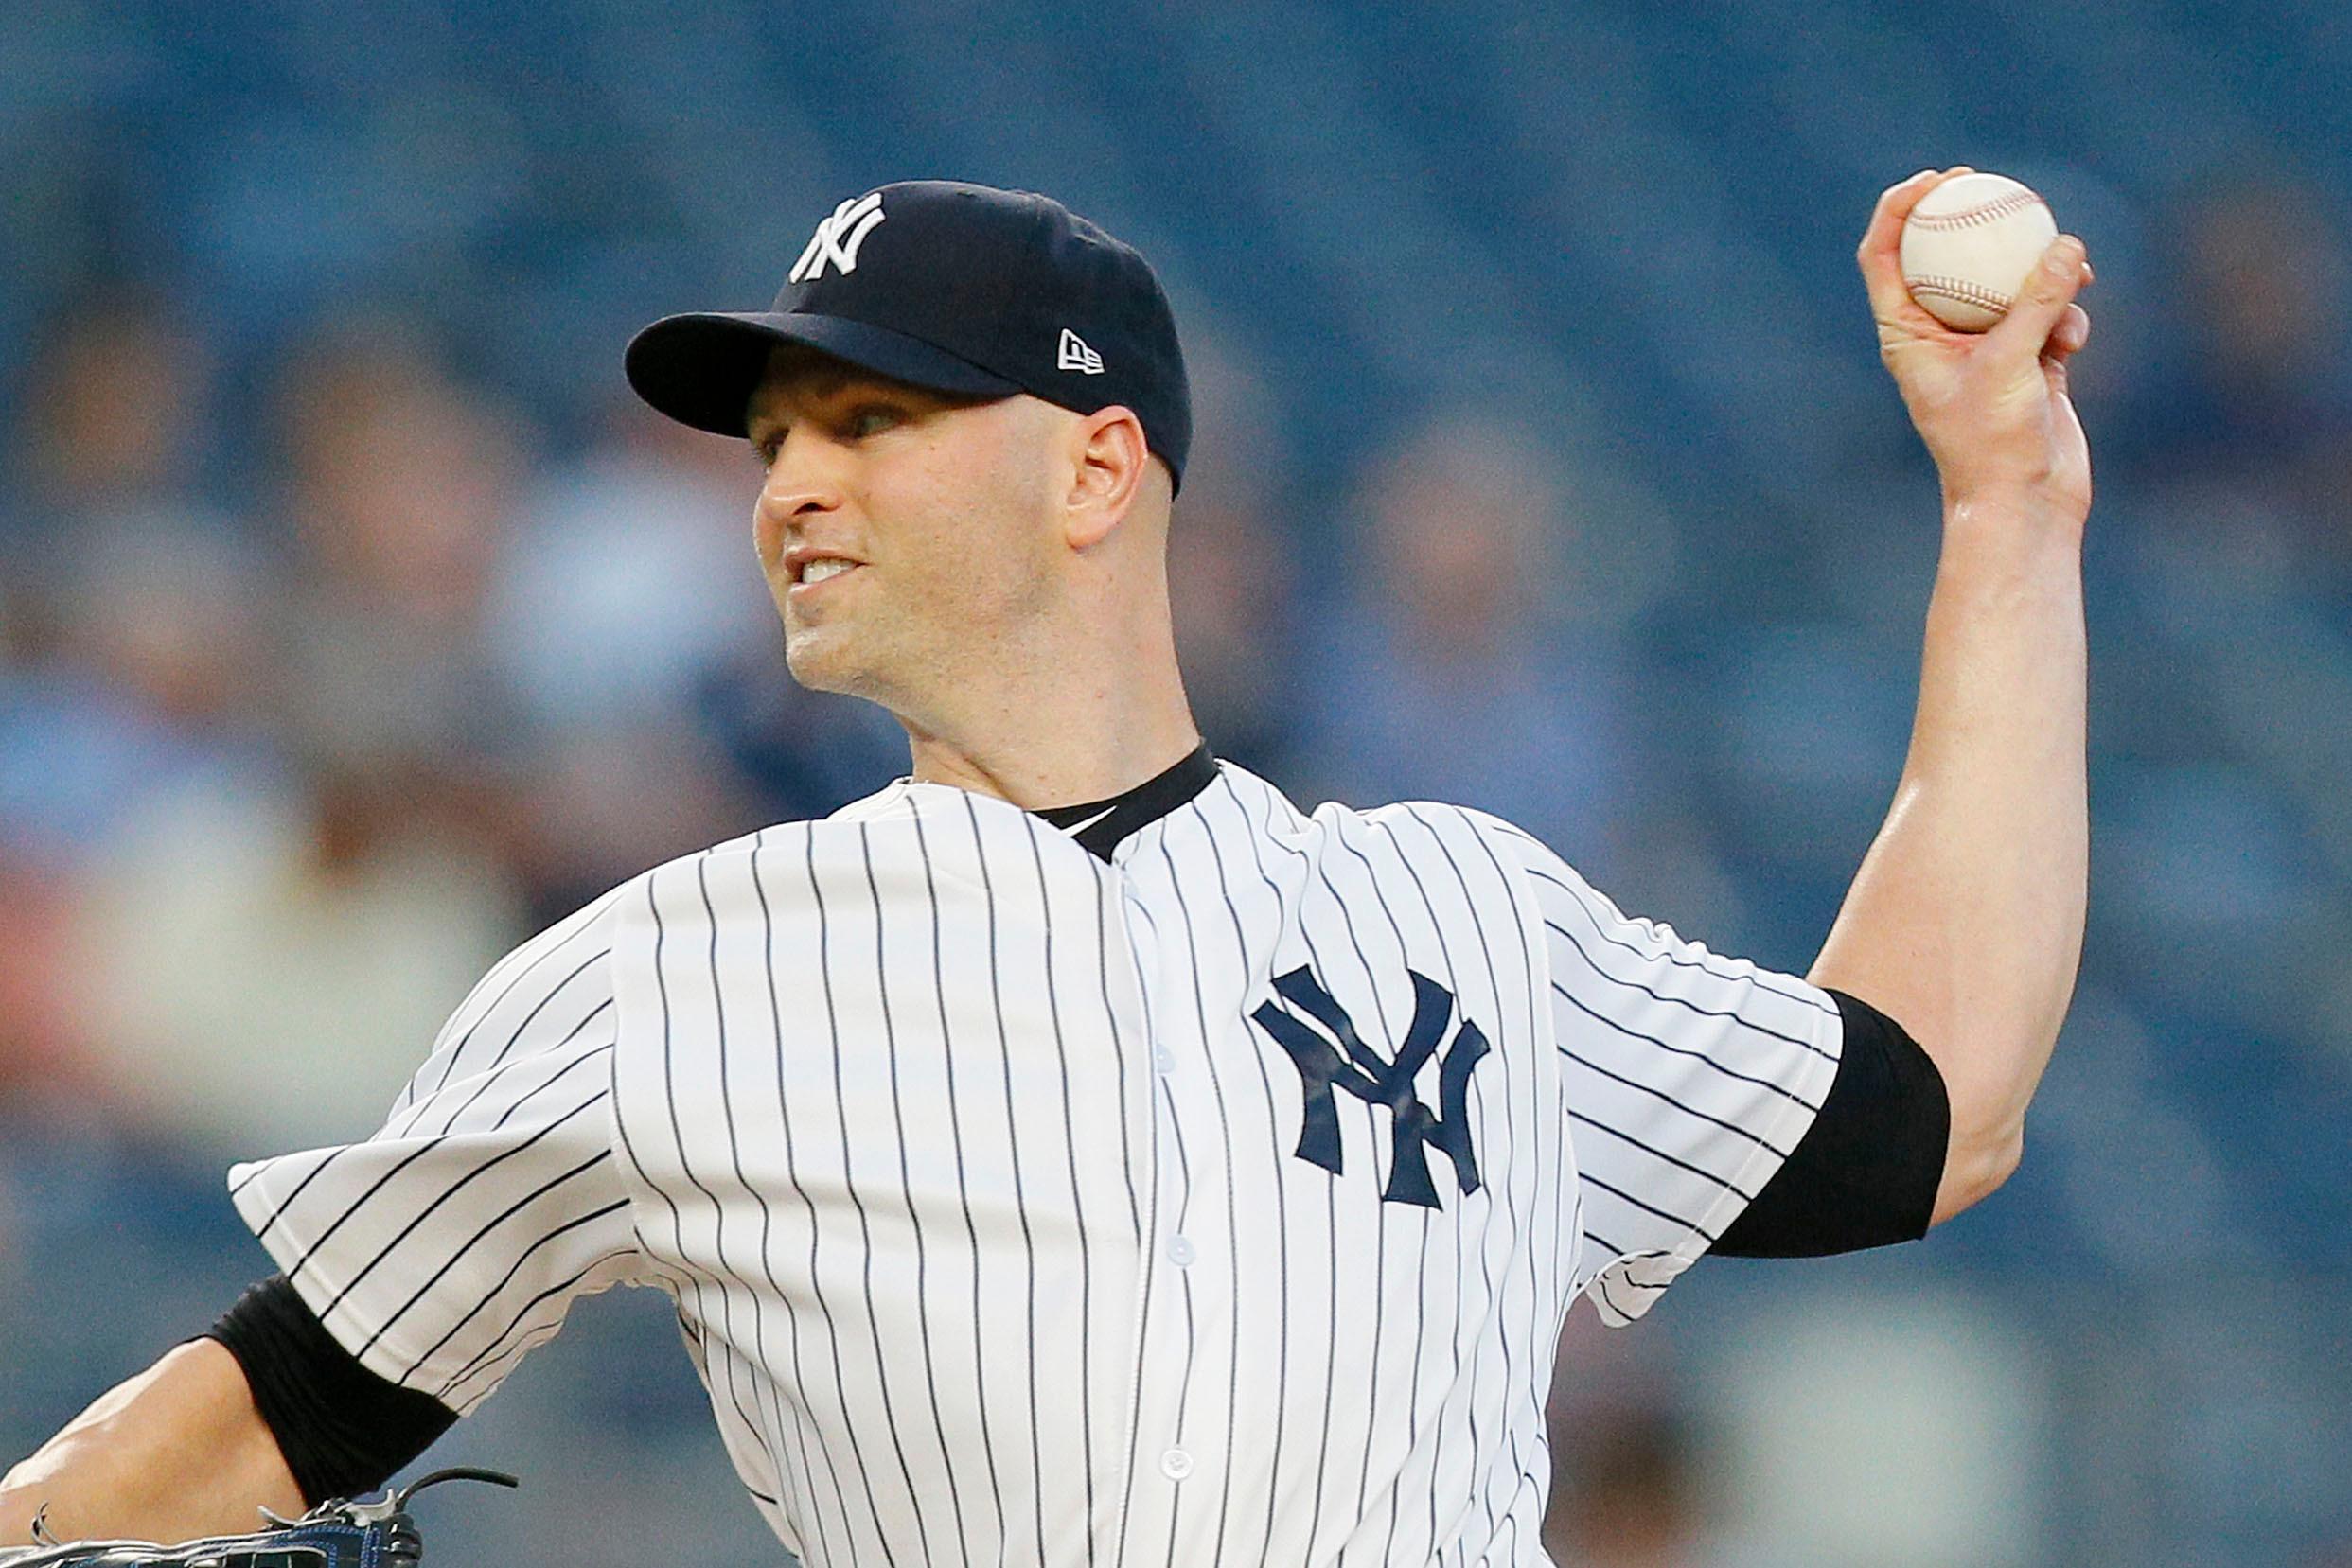 Yankees close to getting J.A. Happ back